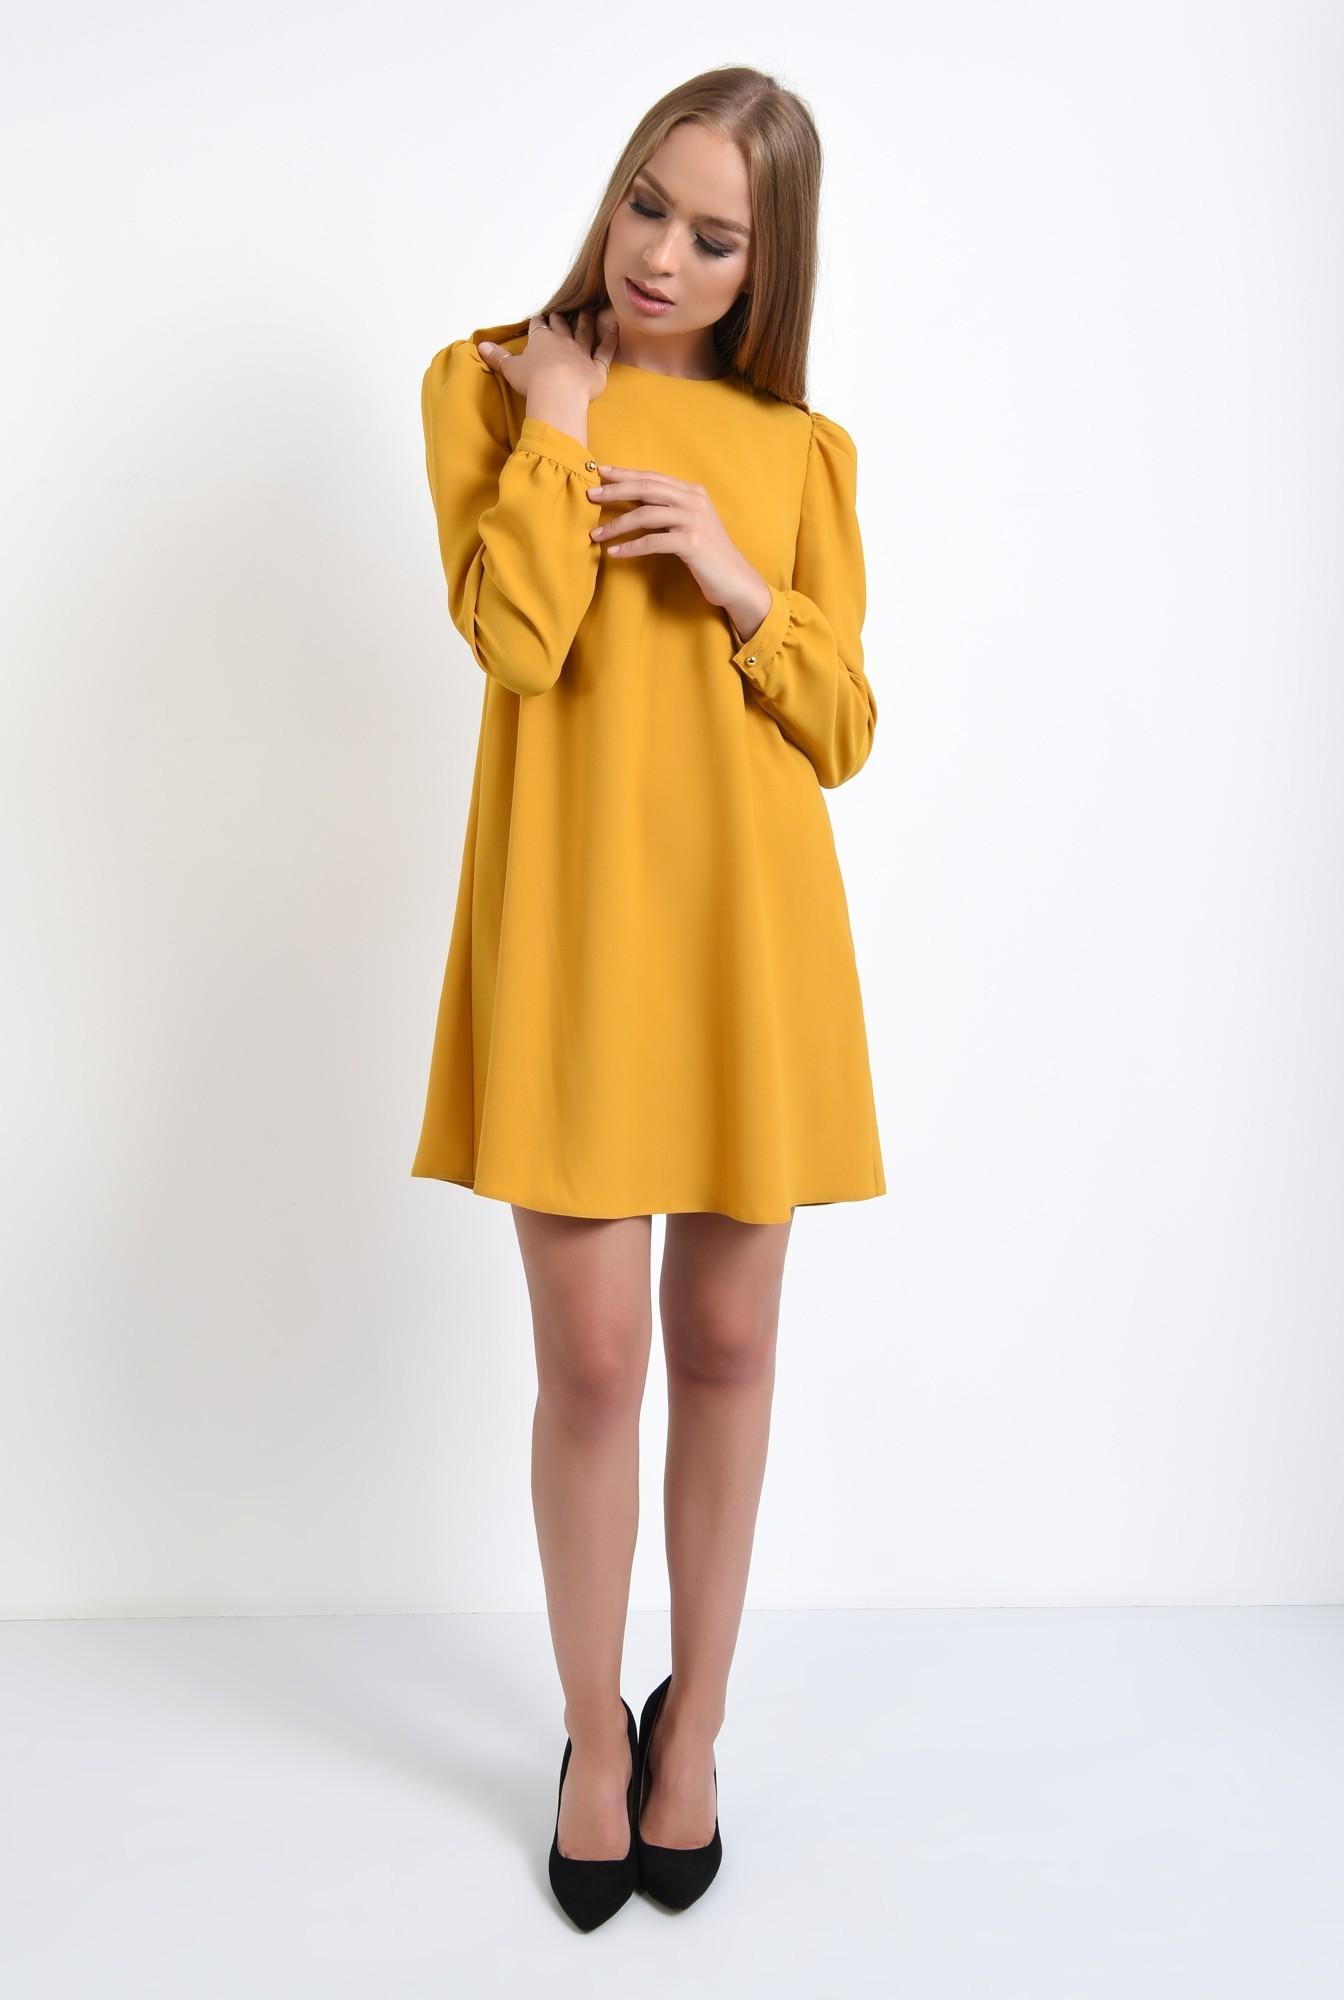 3 - rochie casual, scurta, mustar, evazata